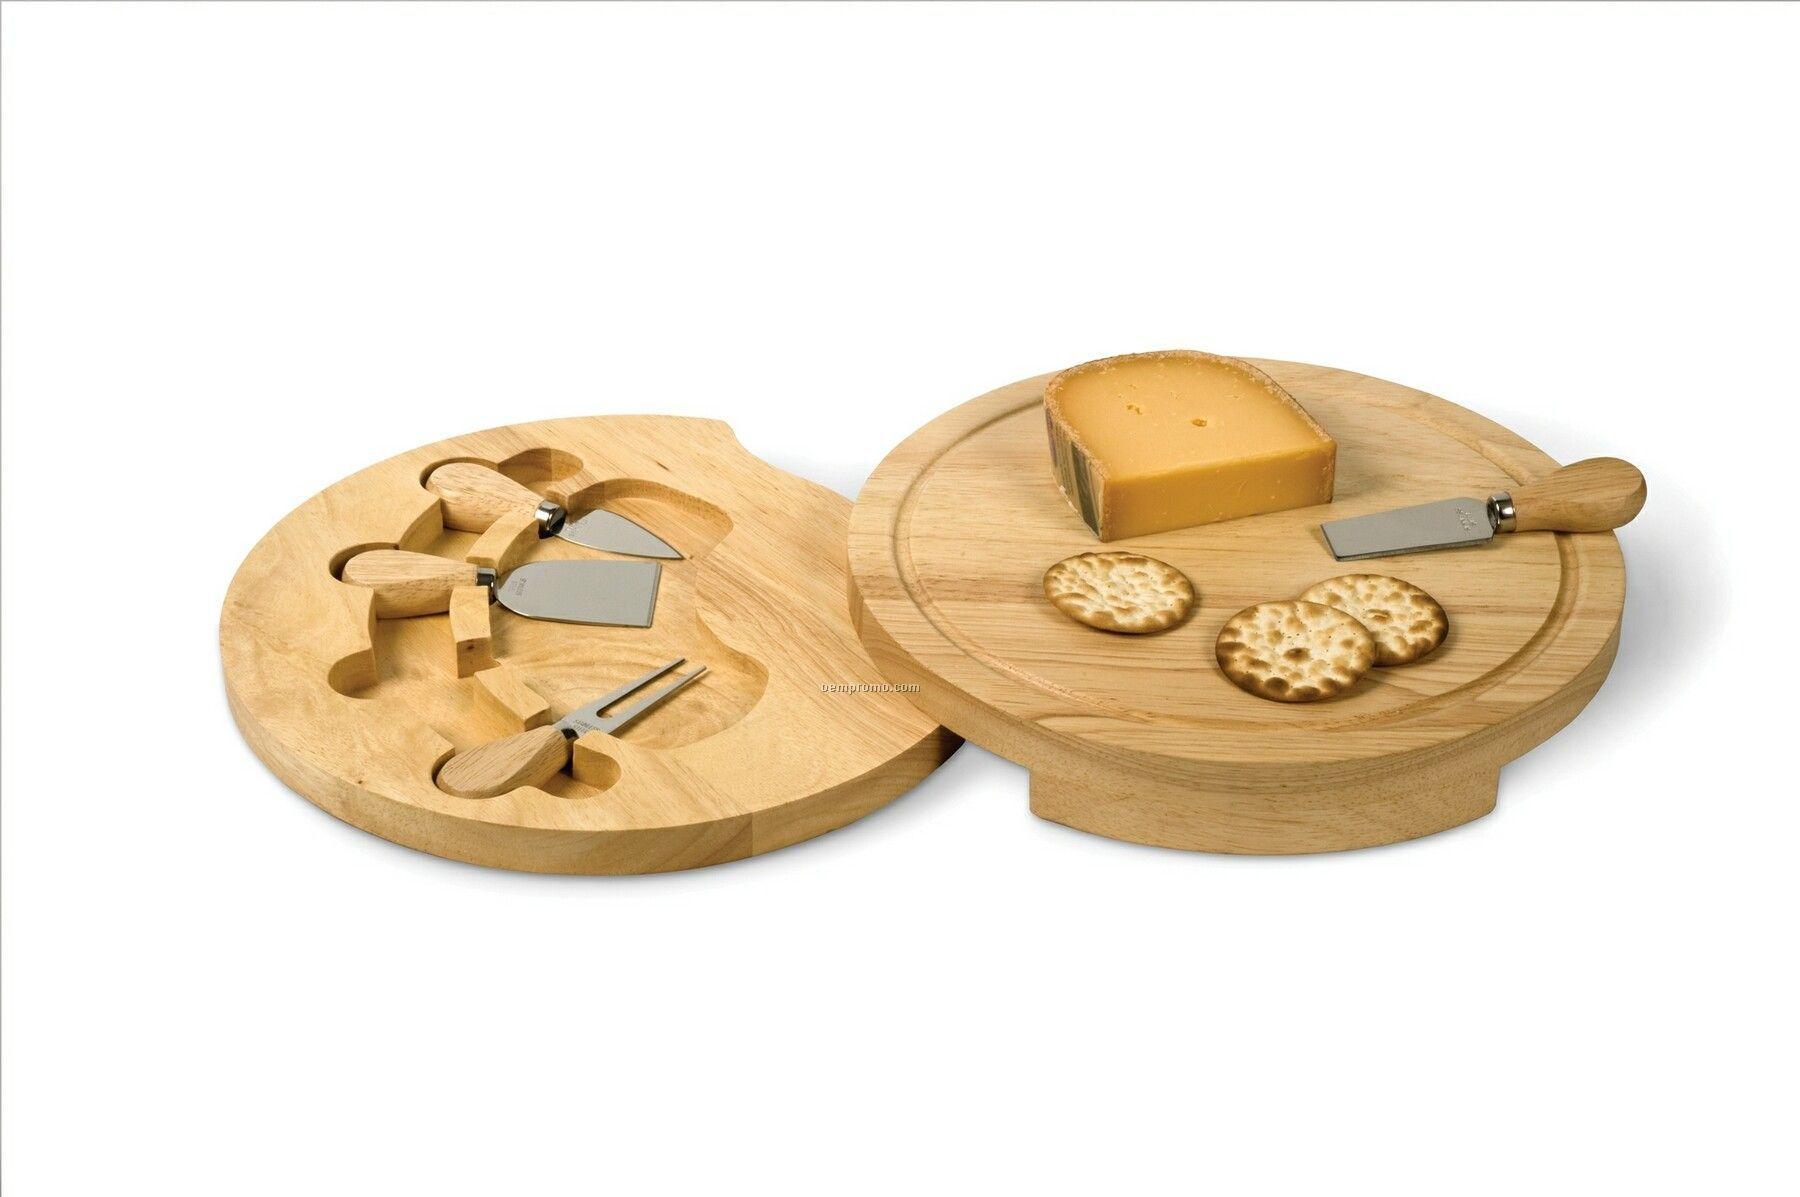 Small Swivel Cheese Board 5 Piece Set